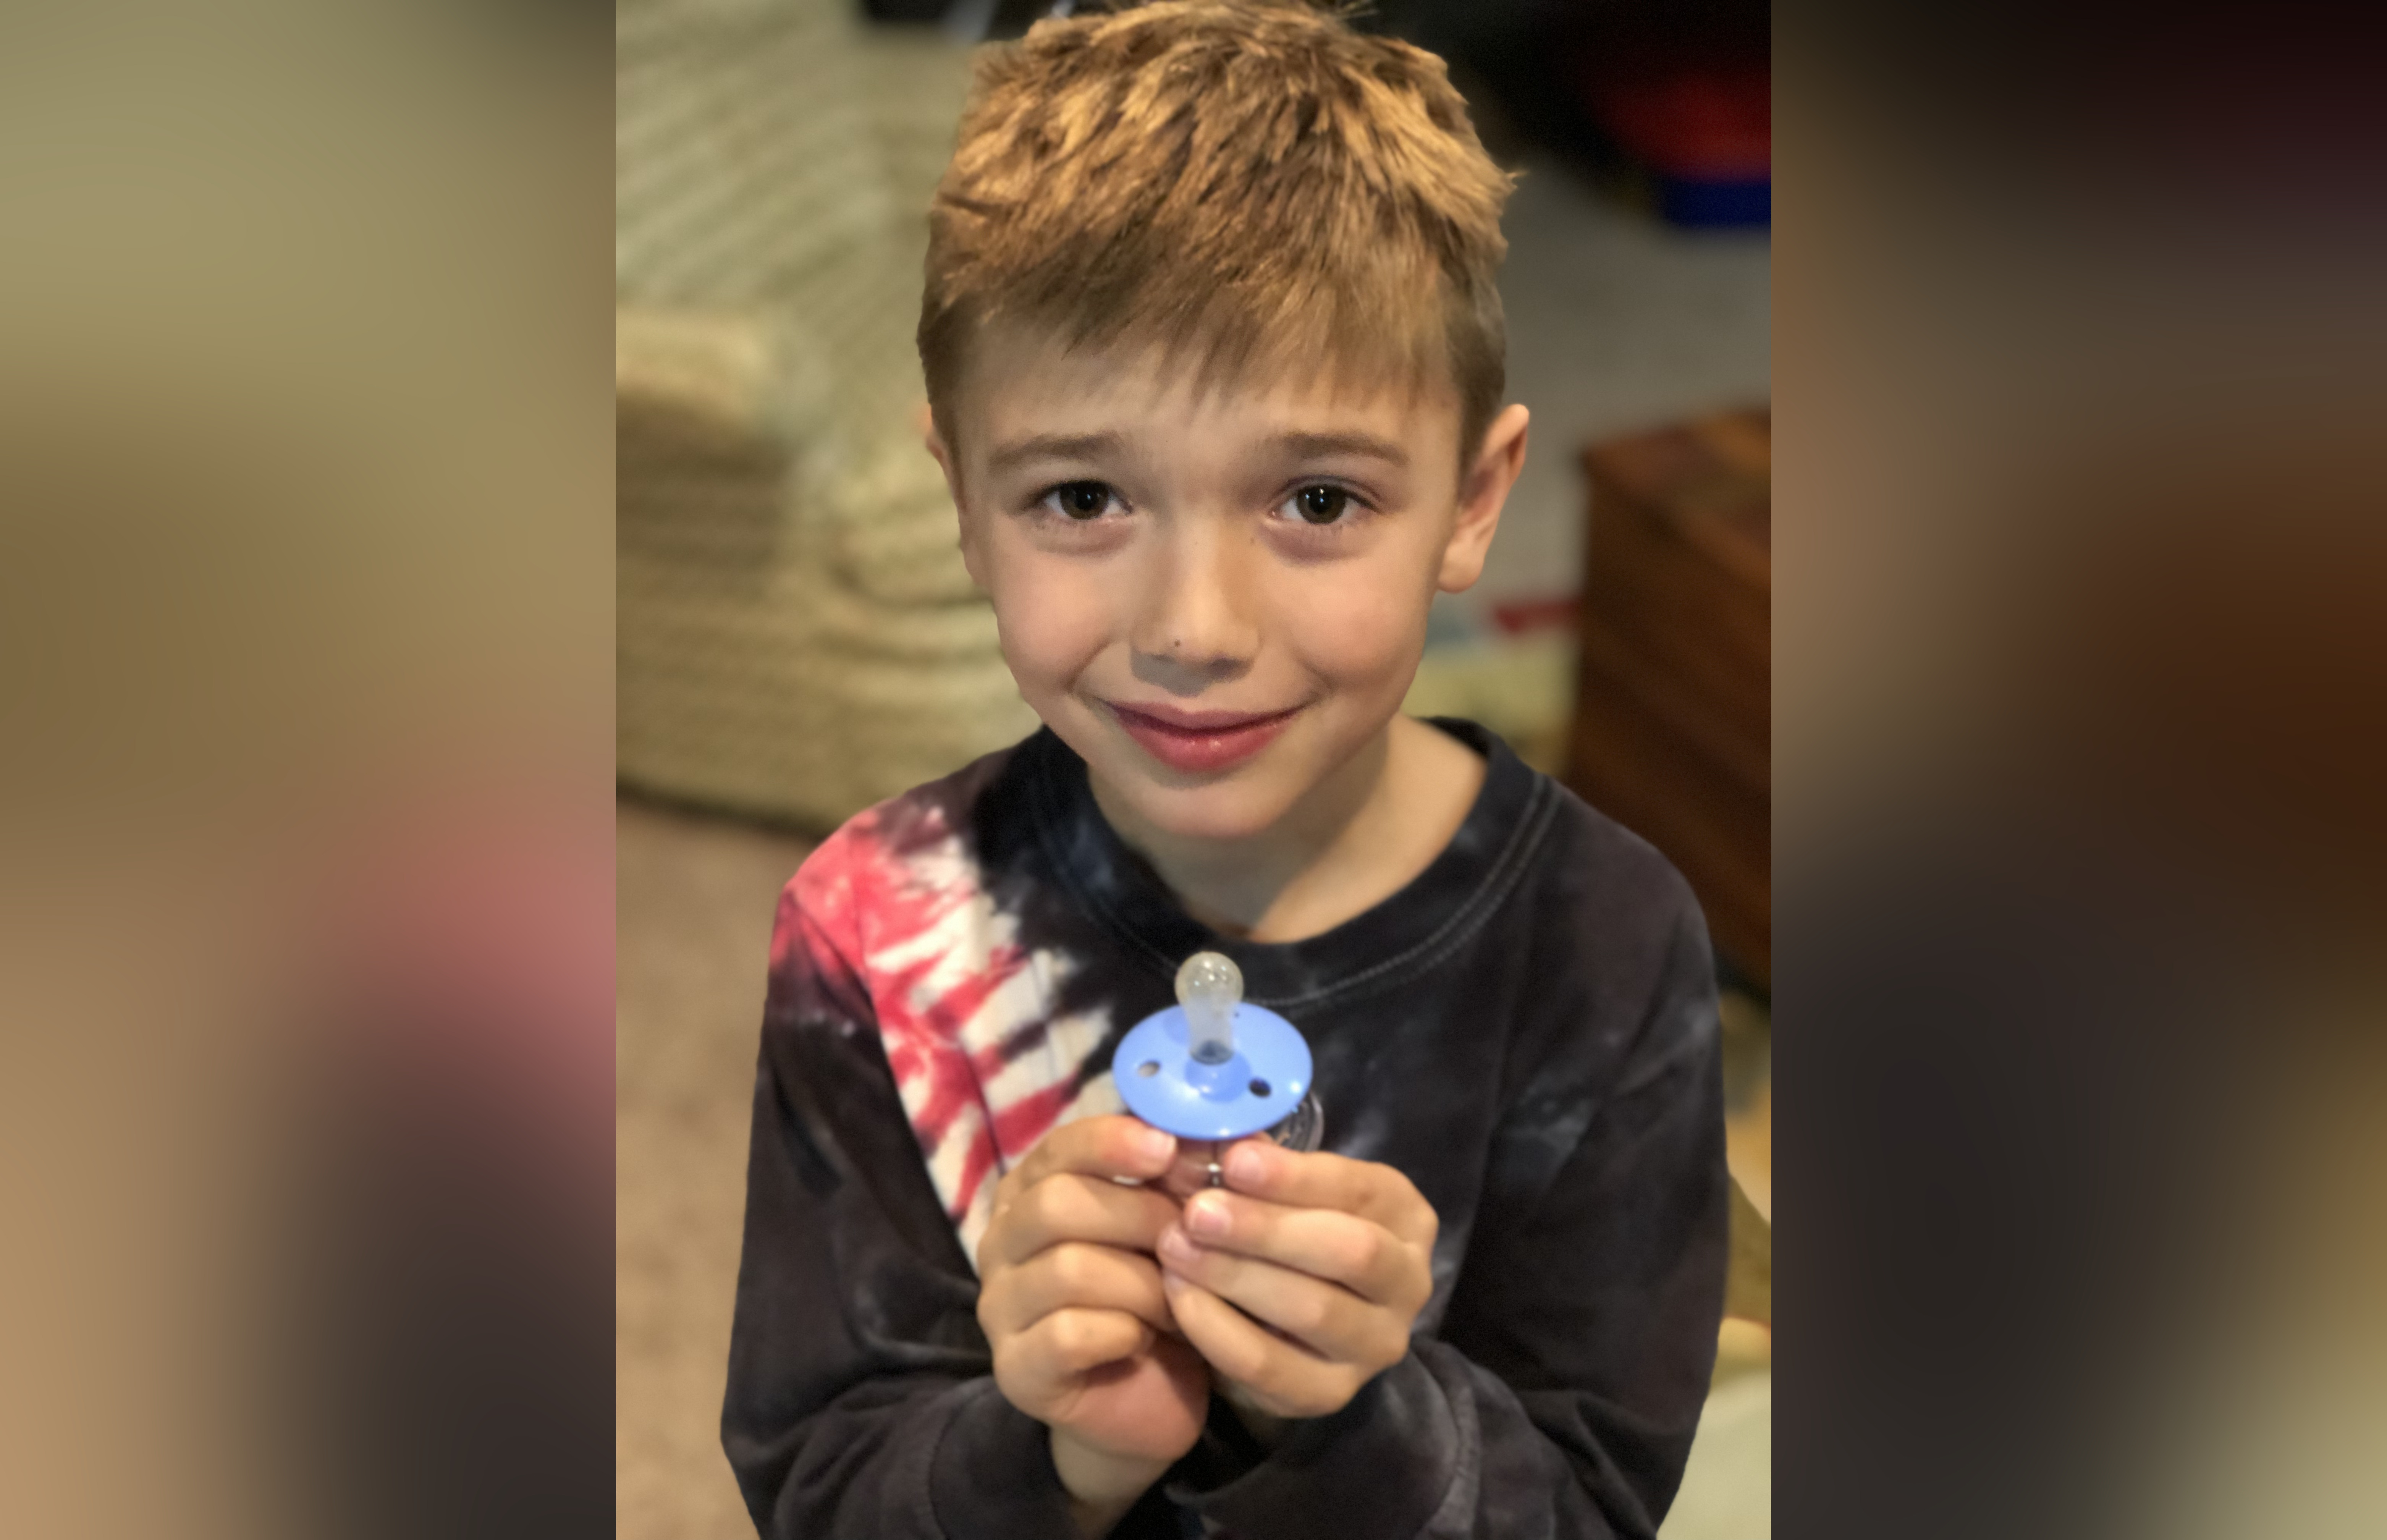 Little boy holding blue pacifier